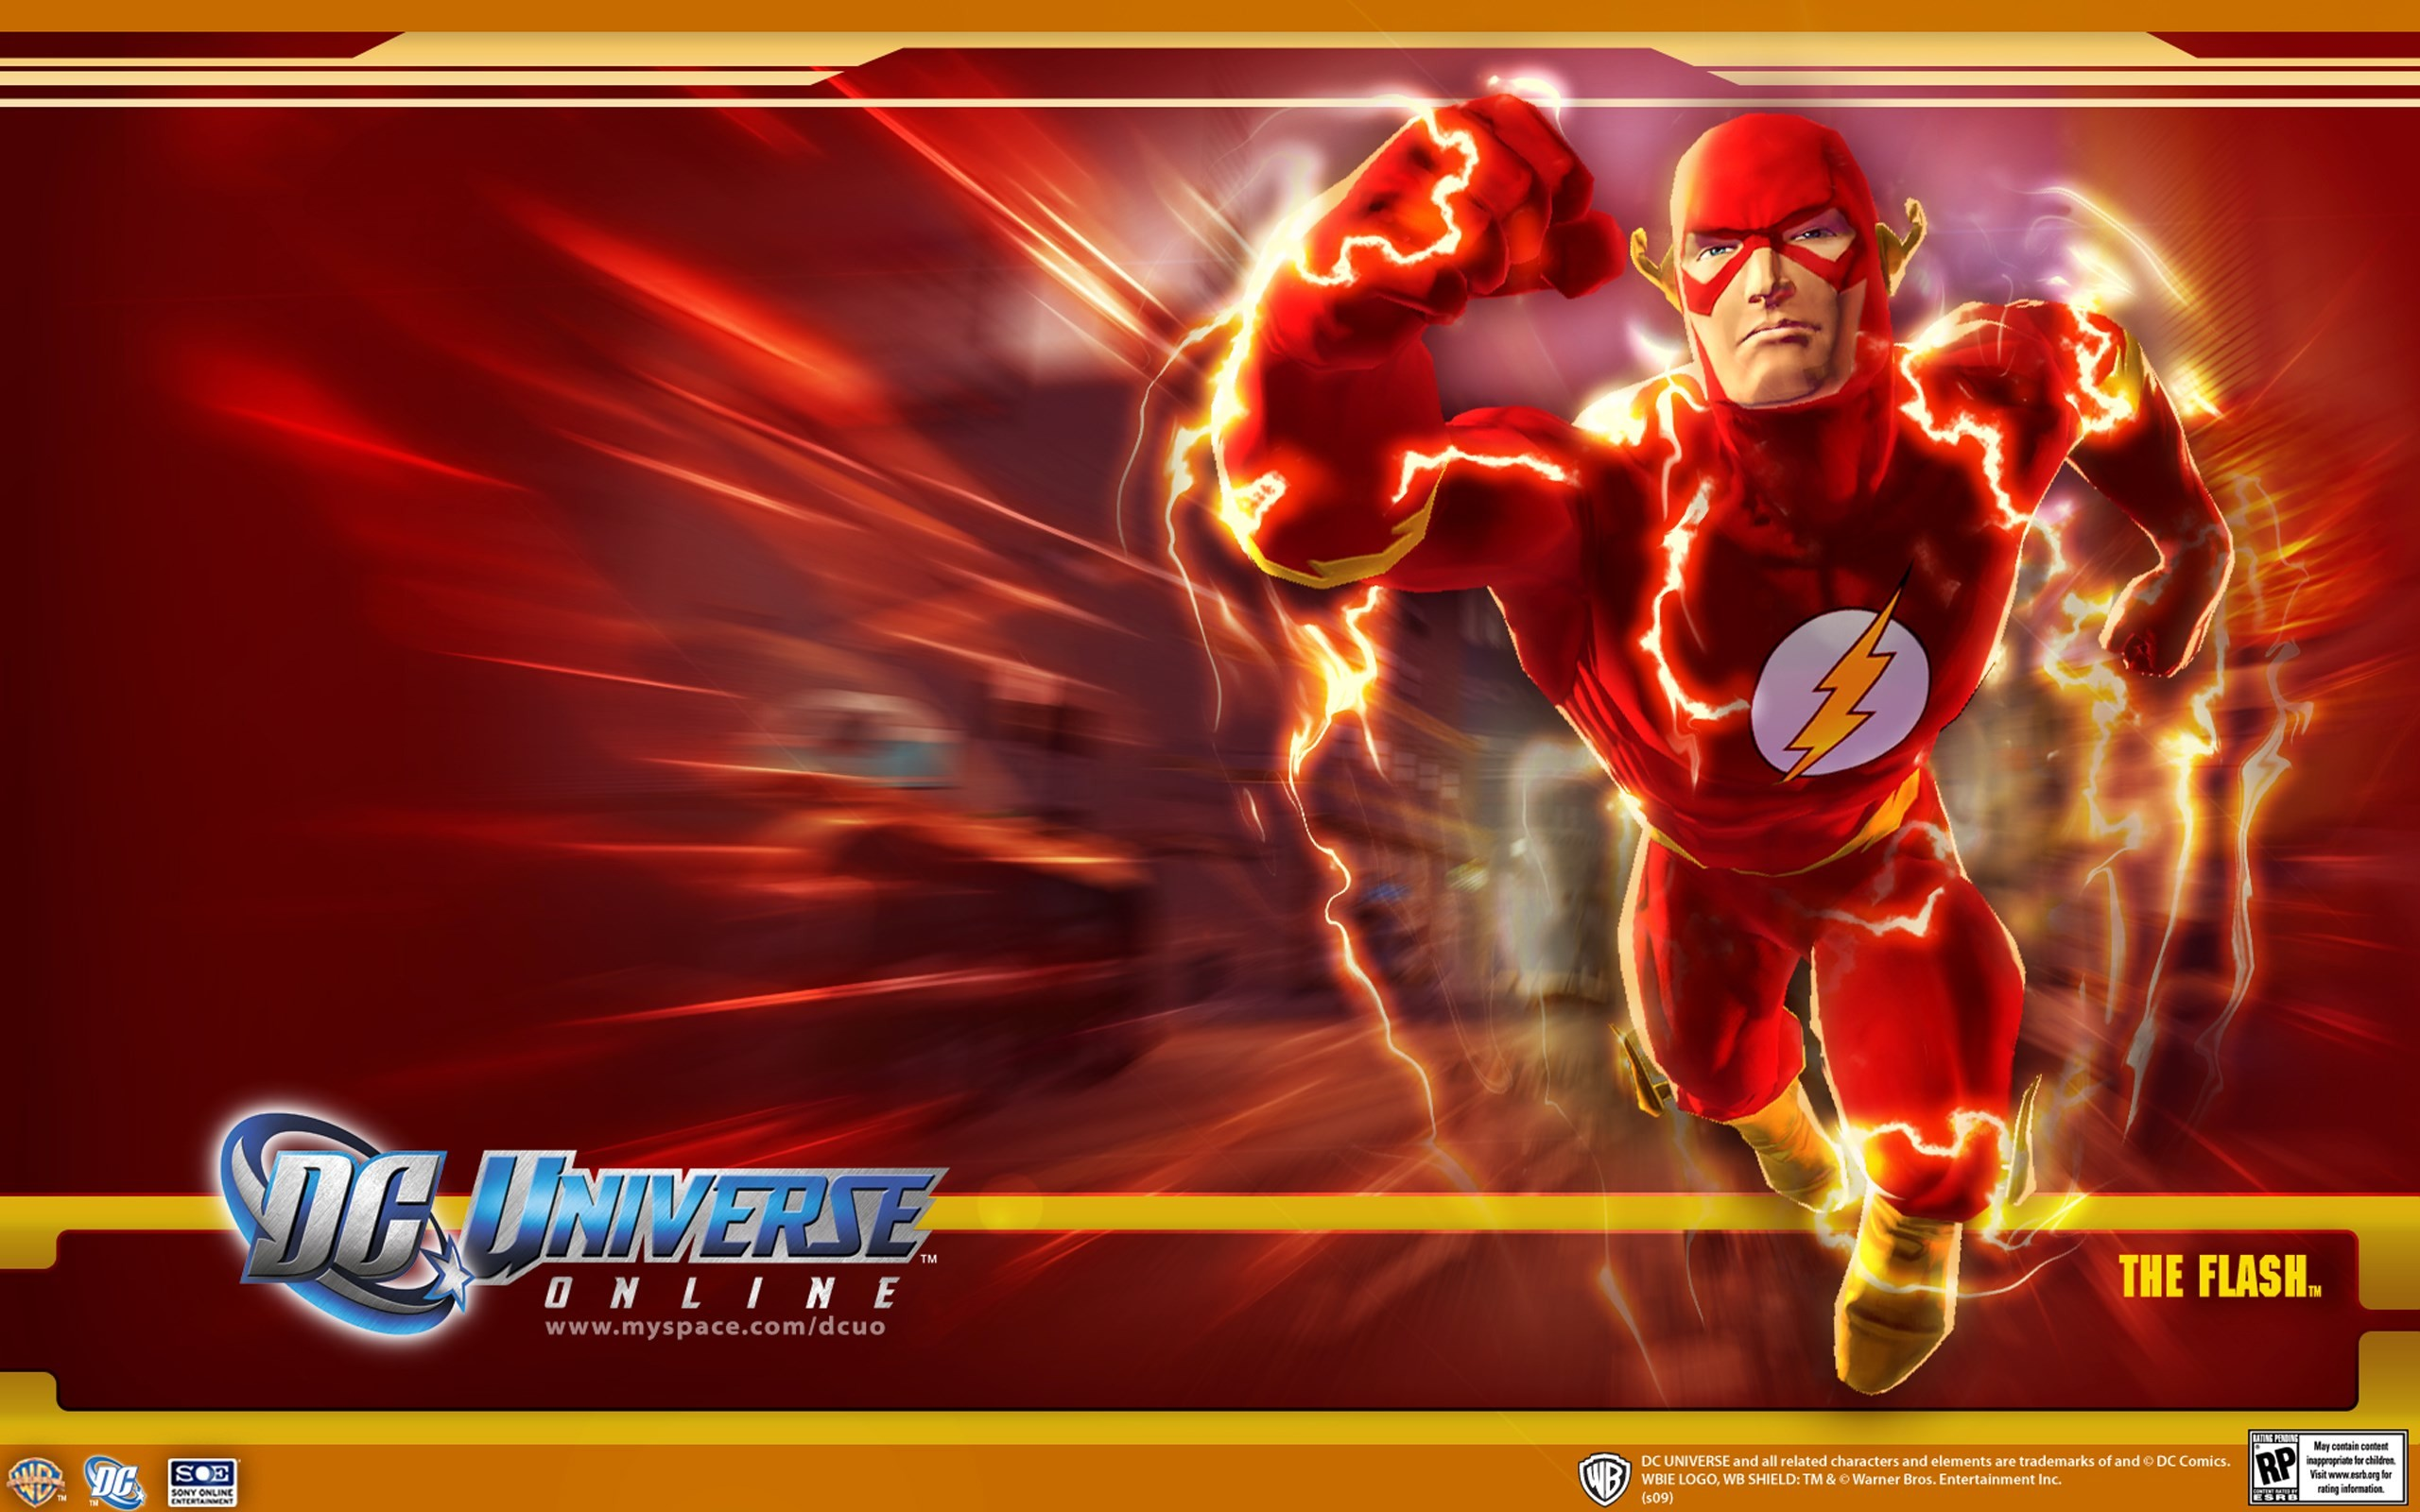 The Flash – DC Universe Online Wallpaper